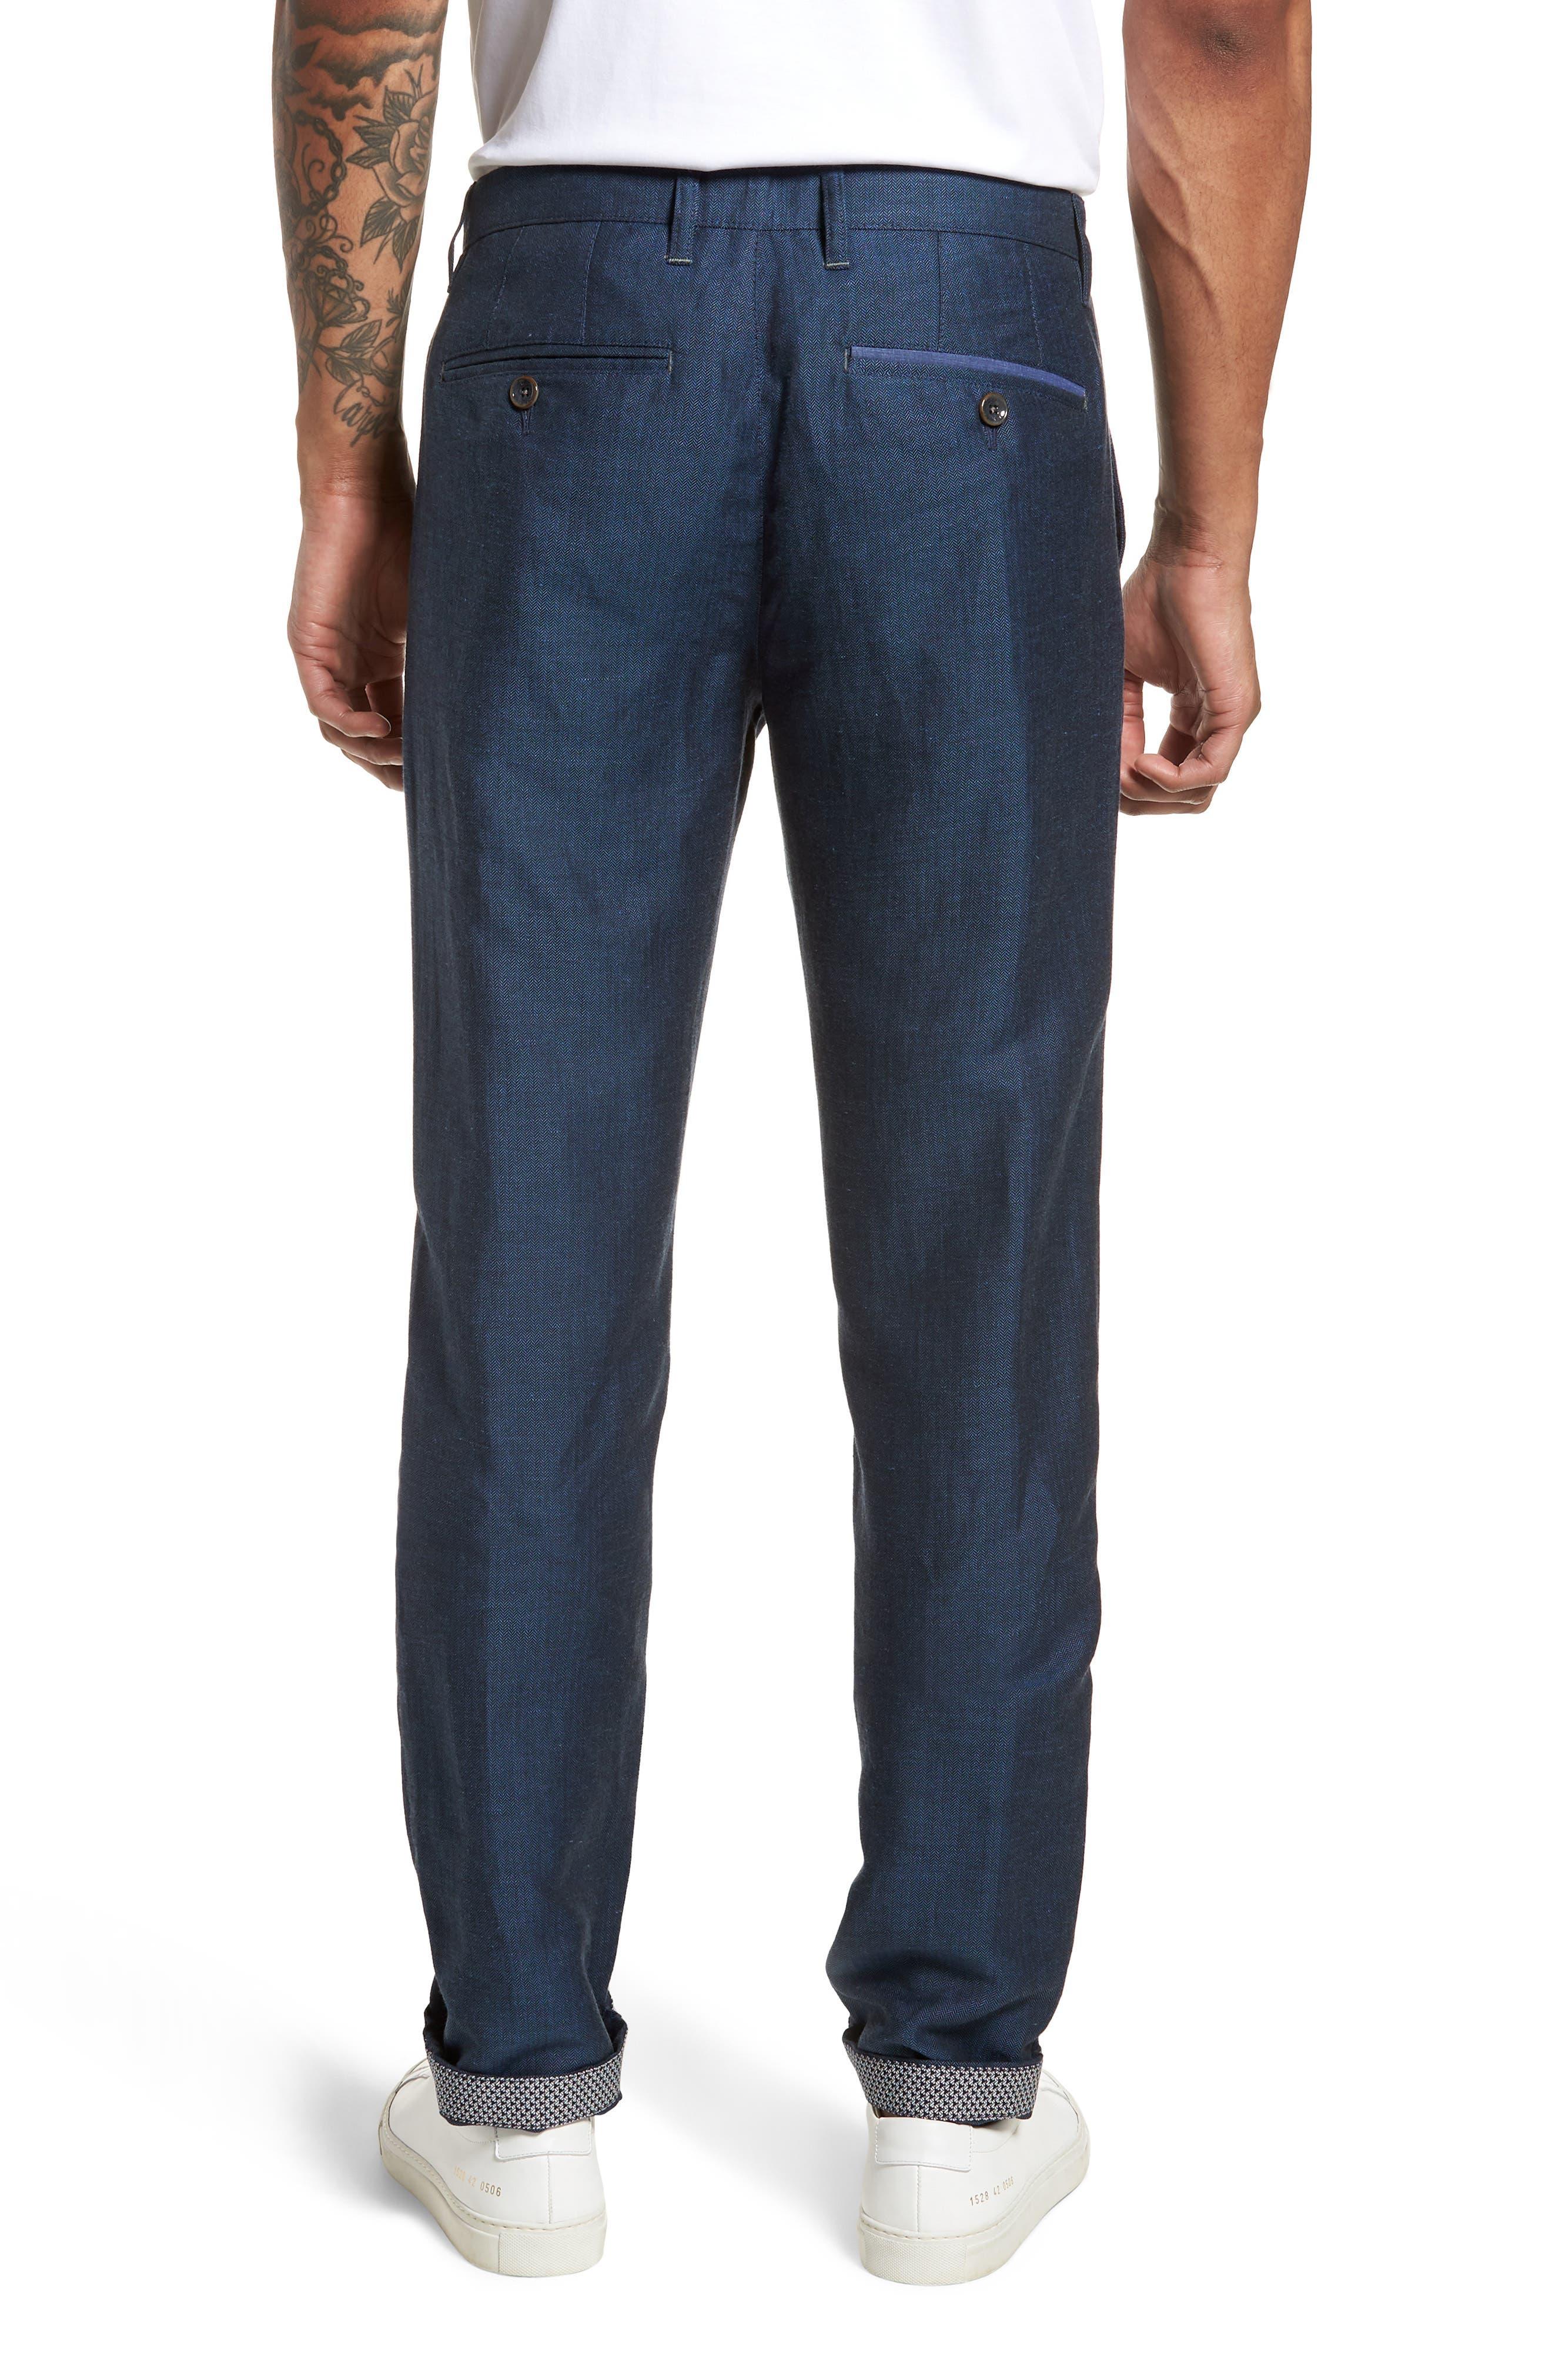 Cazzman Flat Front Stretch Pants,                             Alternate thumbnail 2, color,                             Navy